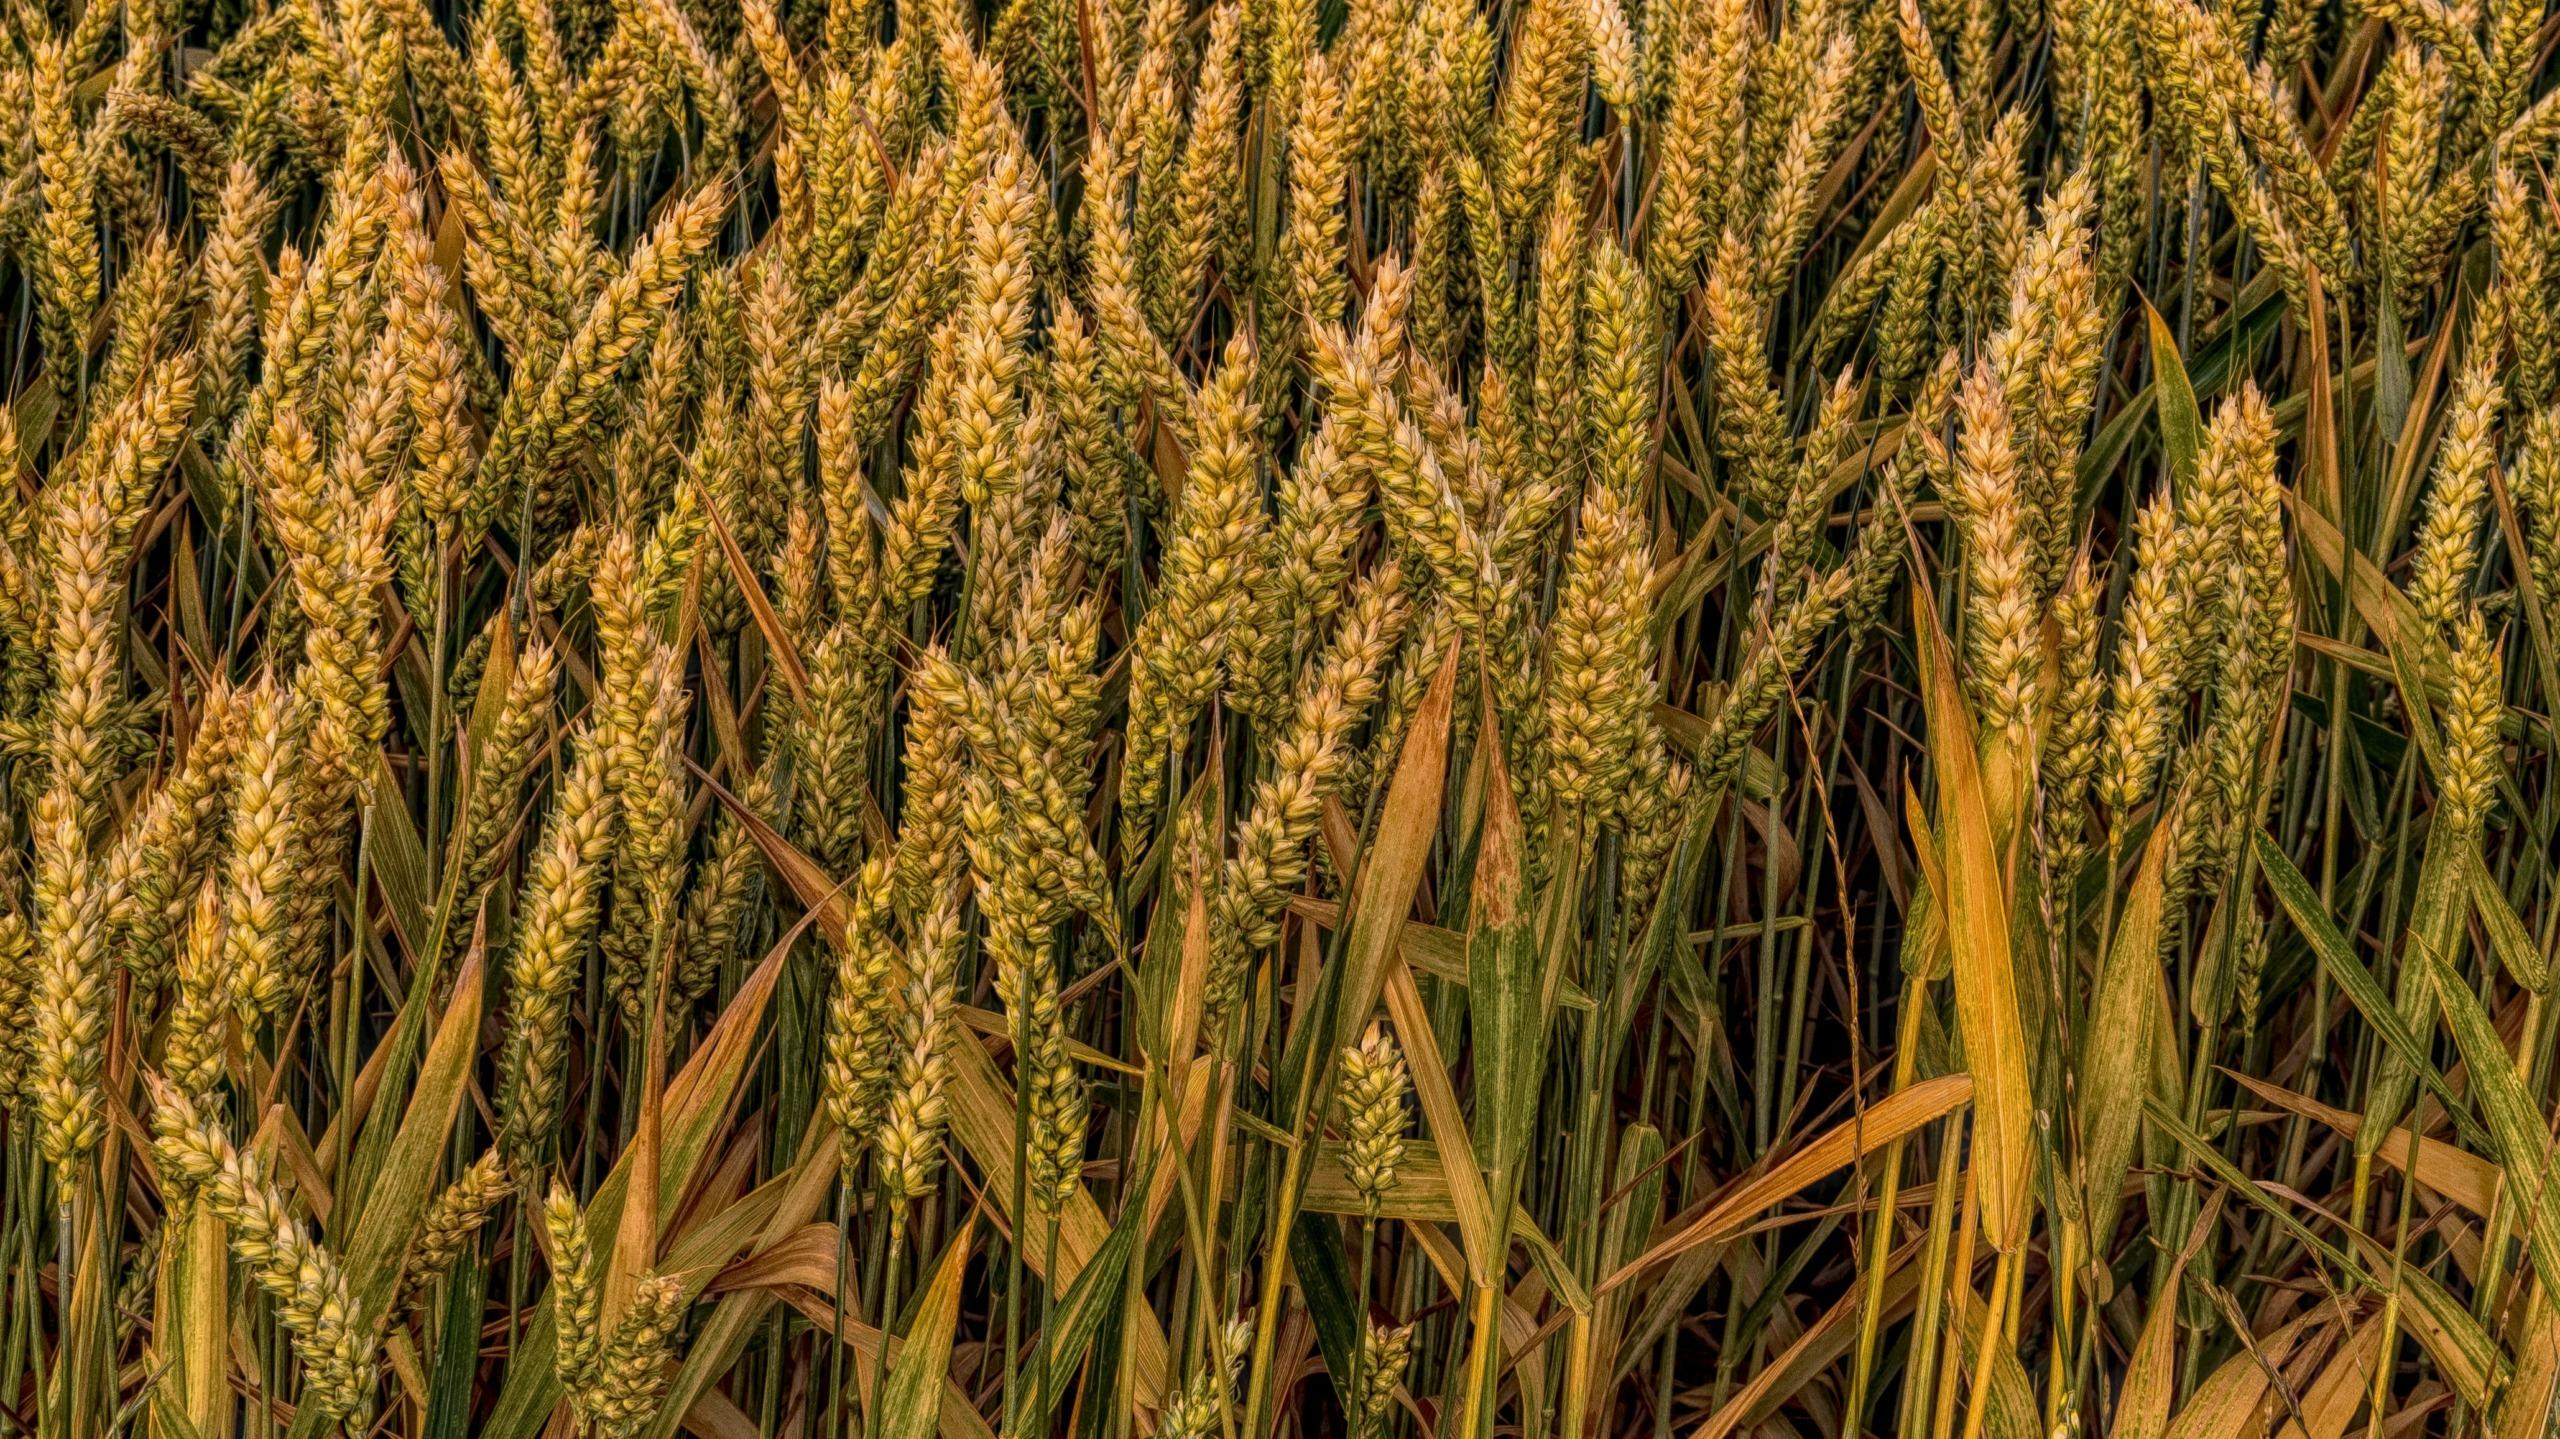 Cereals Close Up Crop 531374